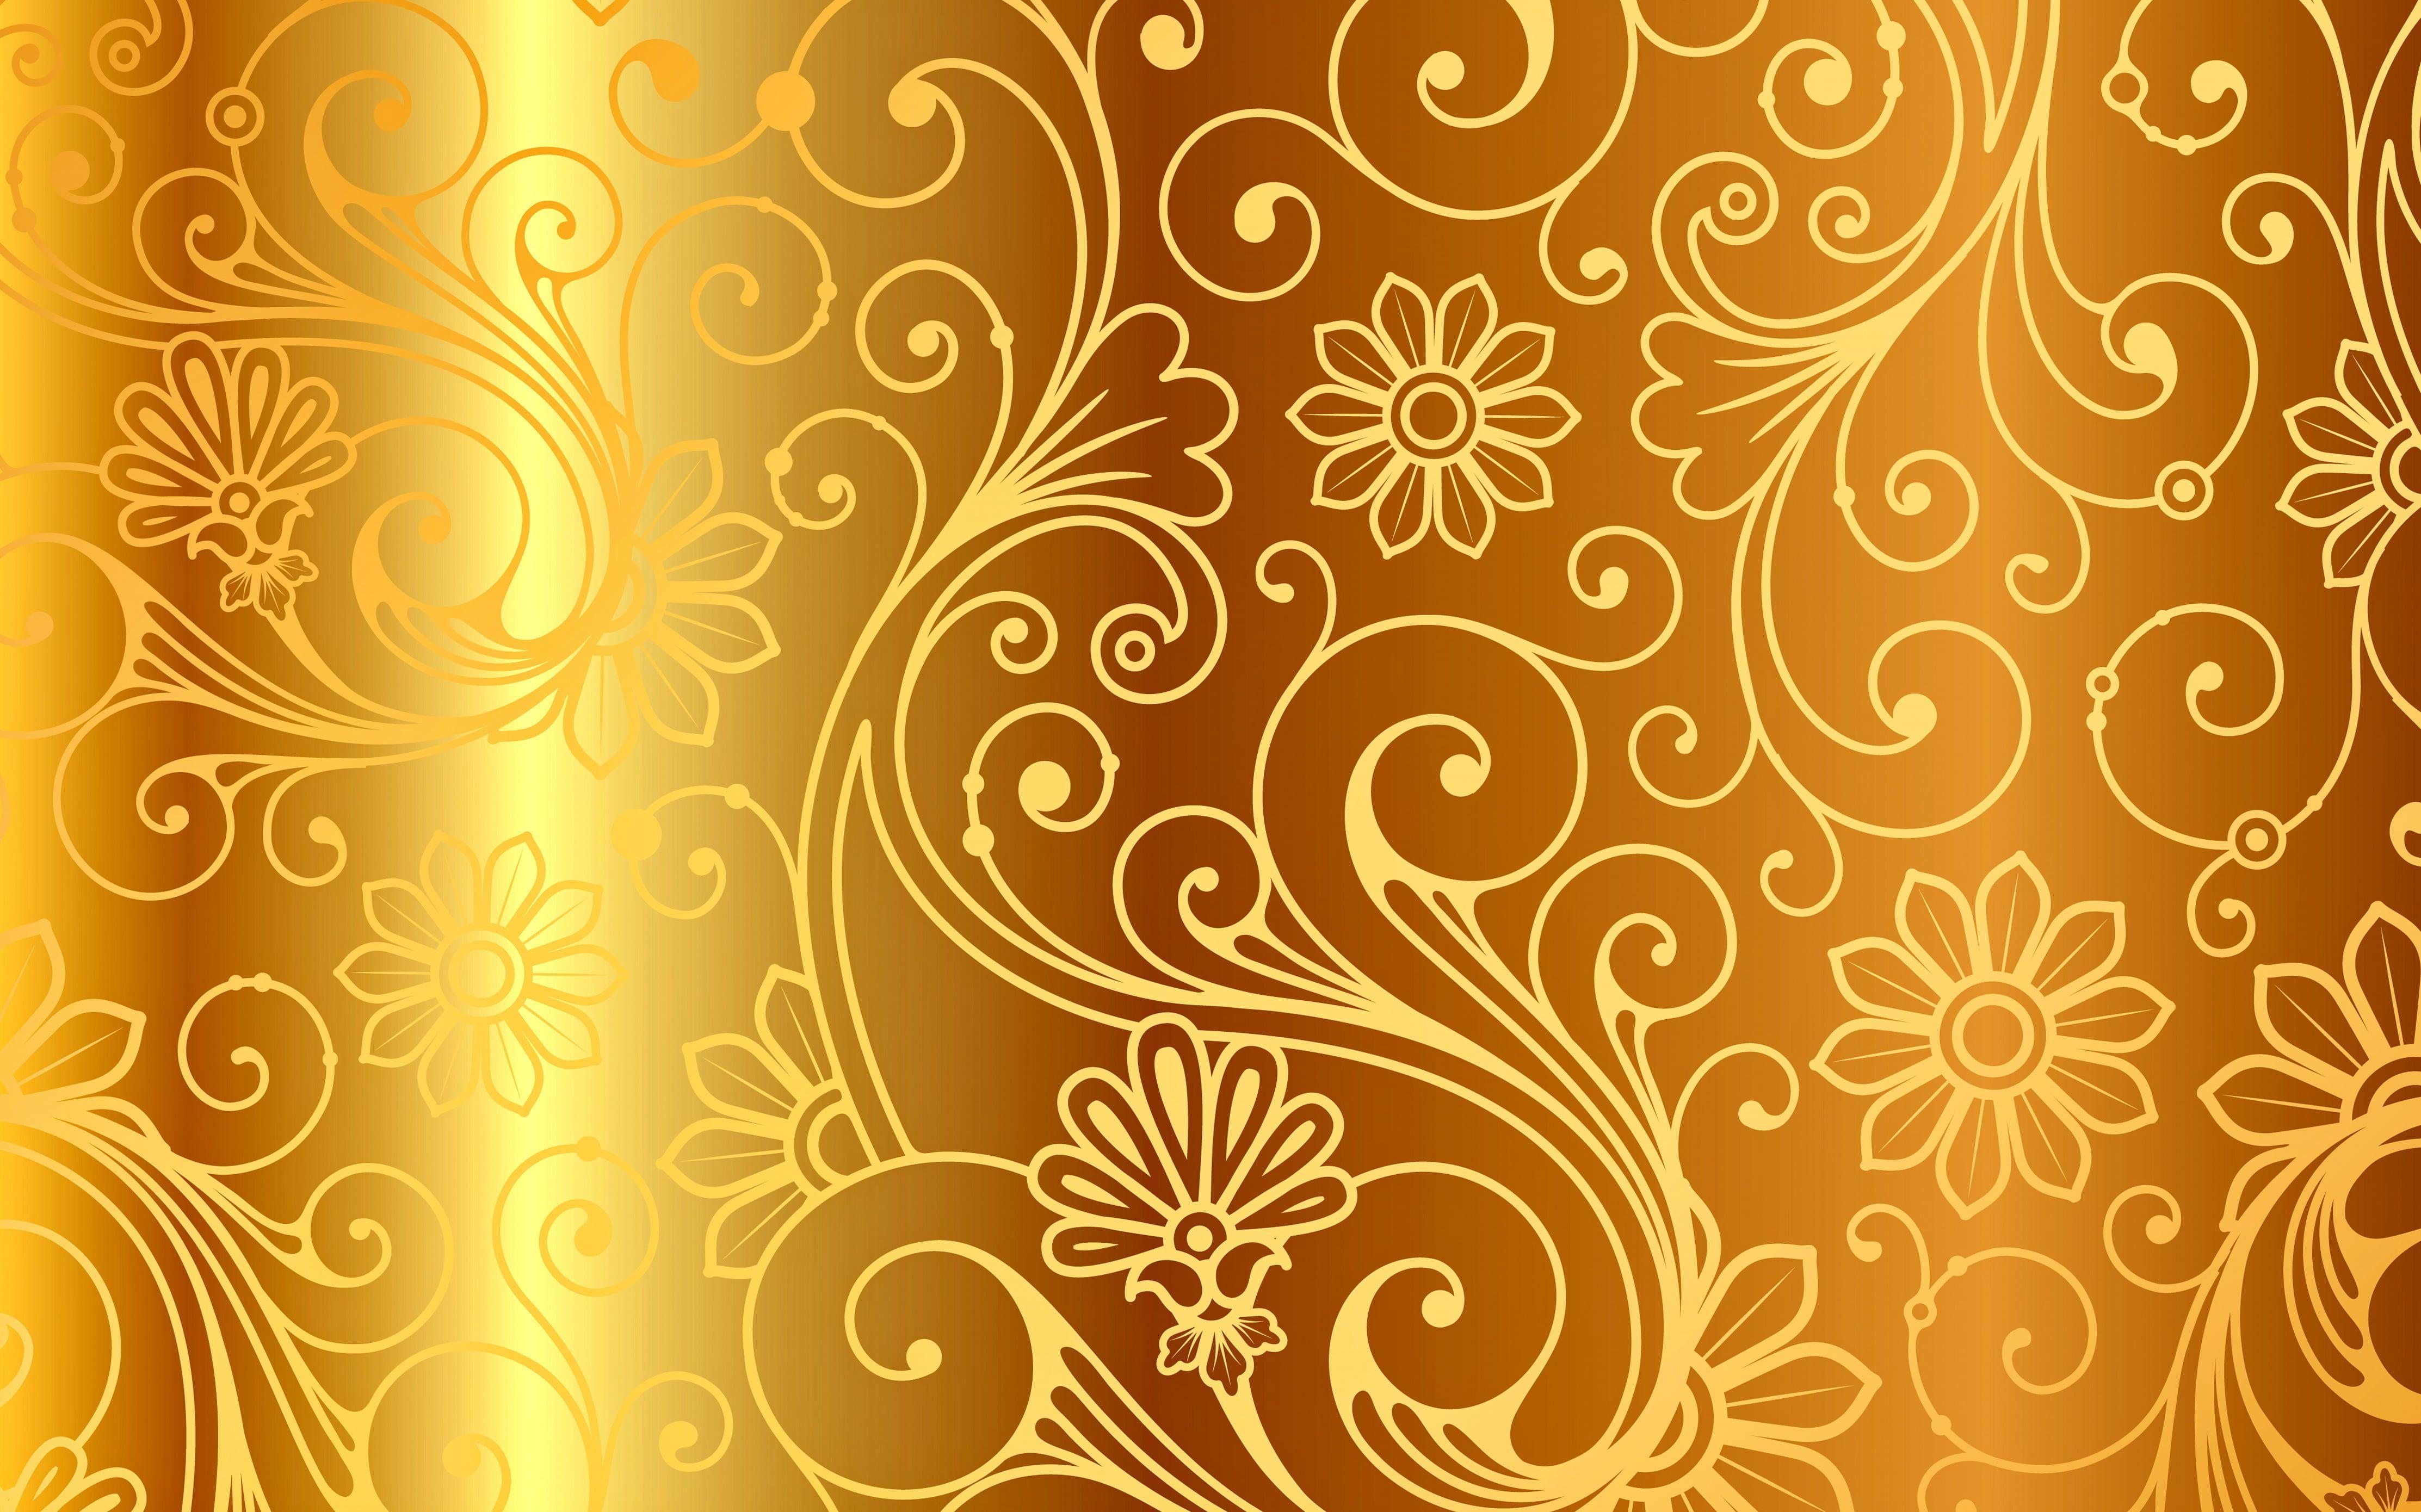 Brown Wallpaper Background Gold Pattern Vector Golden Ornament Vintage Background Pattern Gradi Golden Pattern Floral Background Hd Floral Background